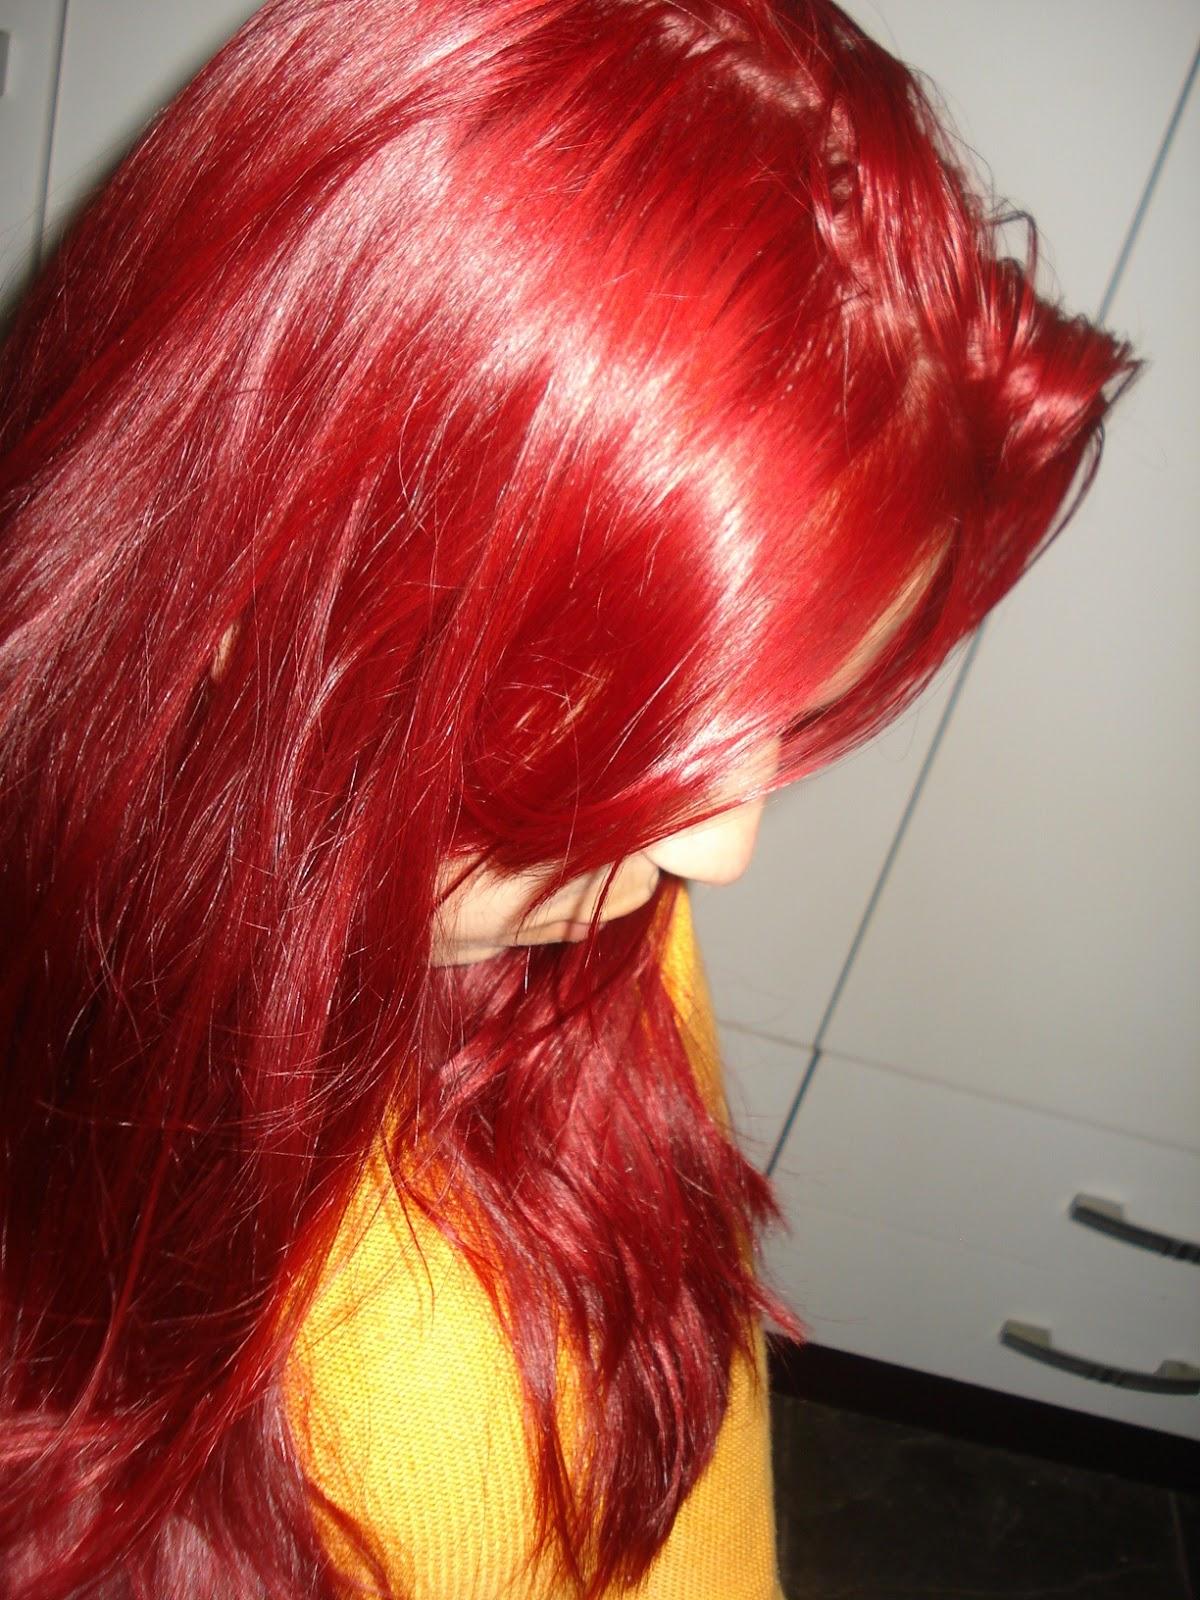 Populares Cabelo de Famosa: Que cor é seu cabelo????? VJ68